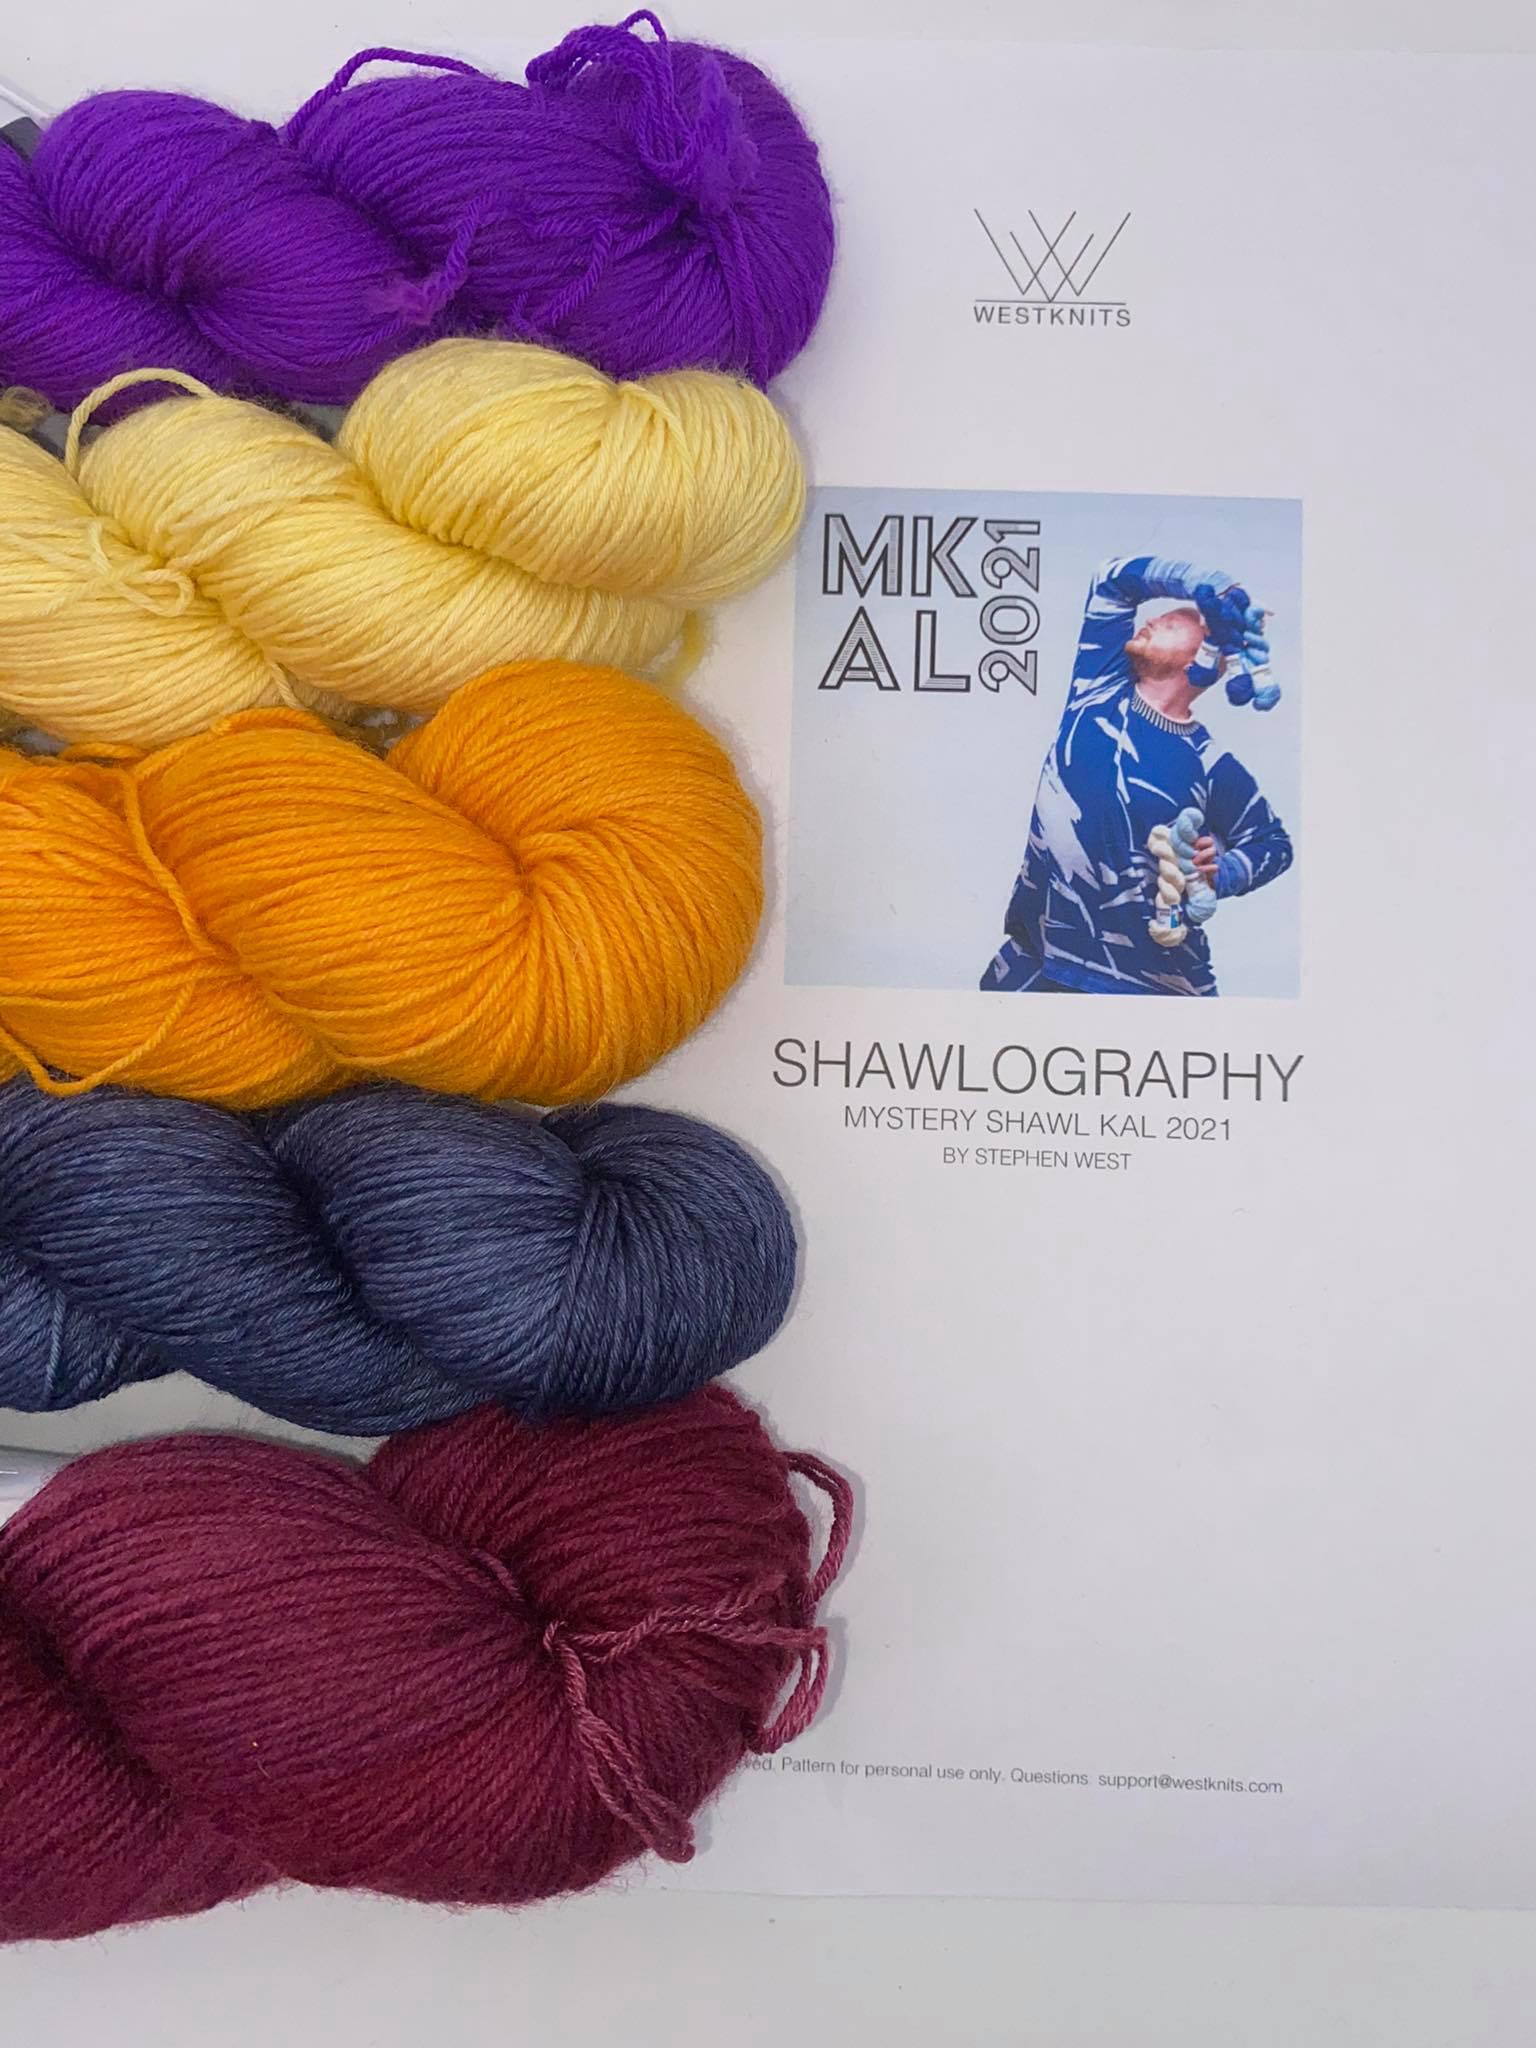 Woll Set Stephen West MKAL Shawlography #22